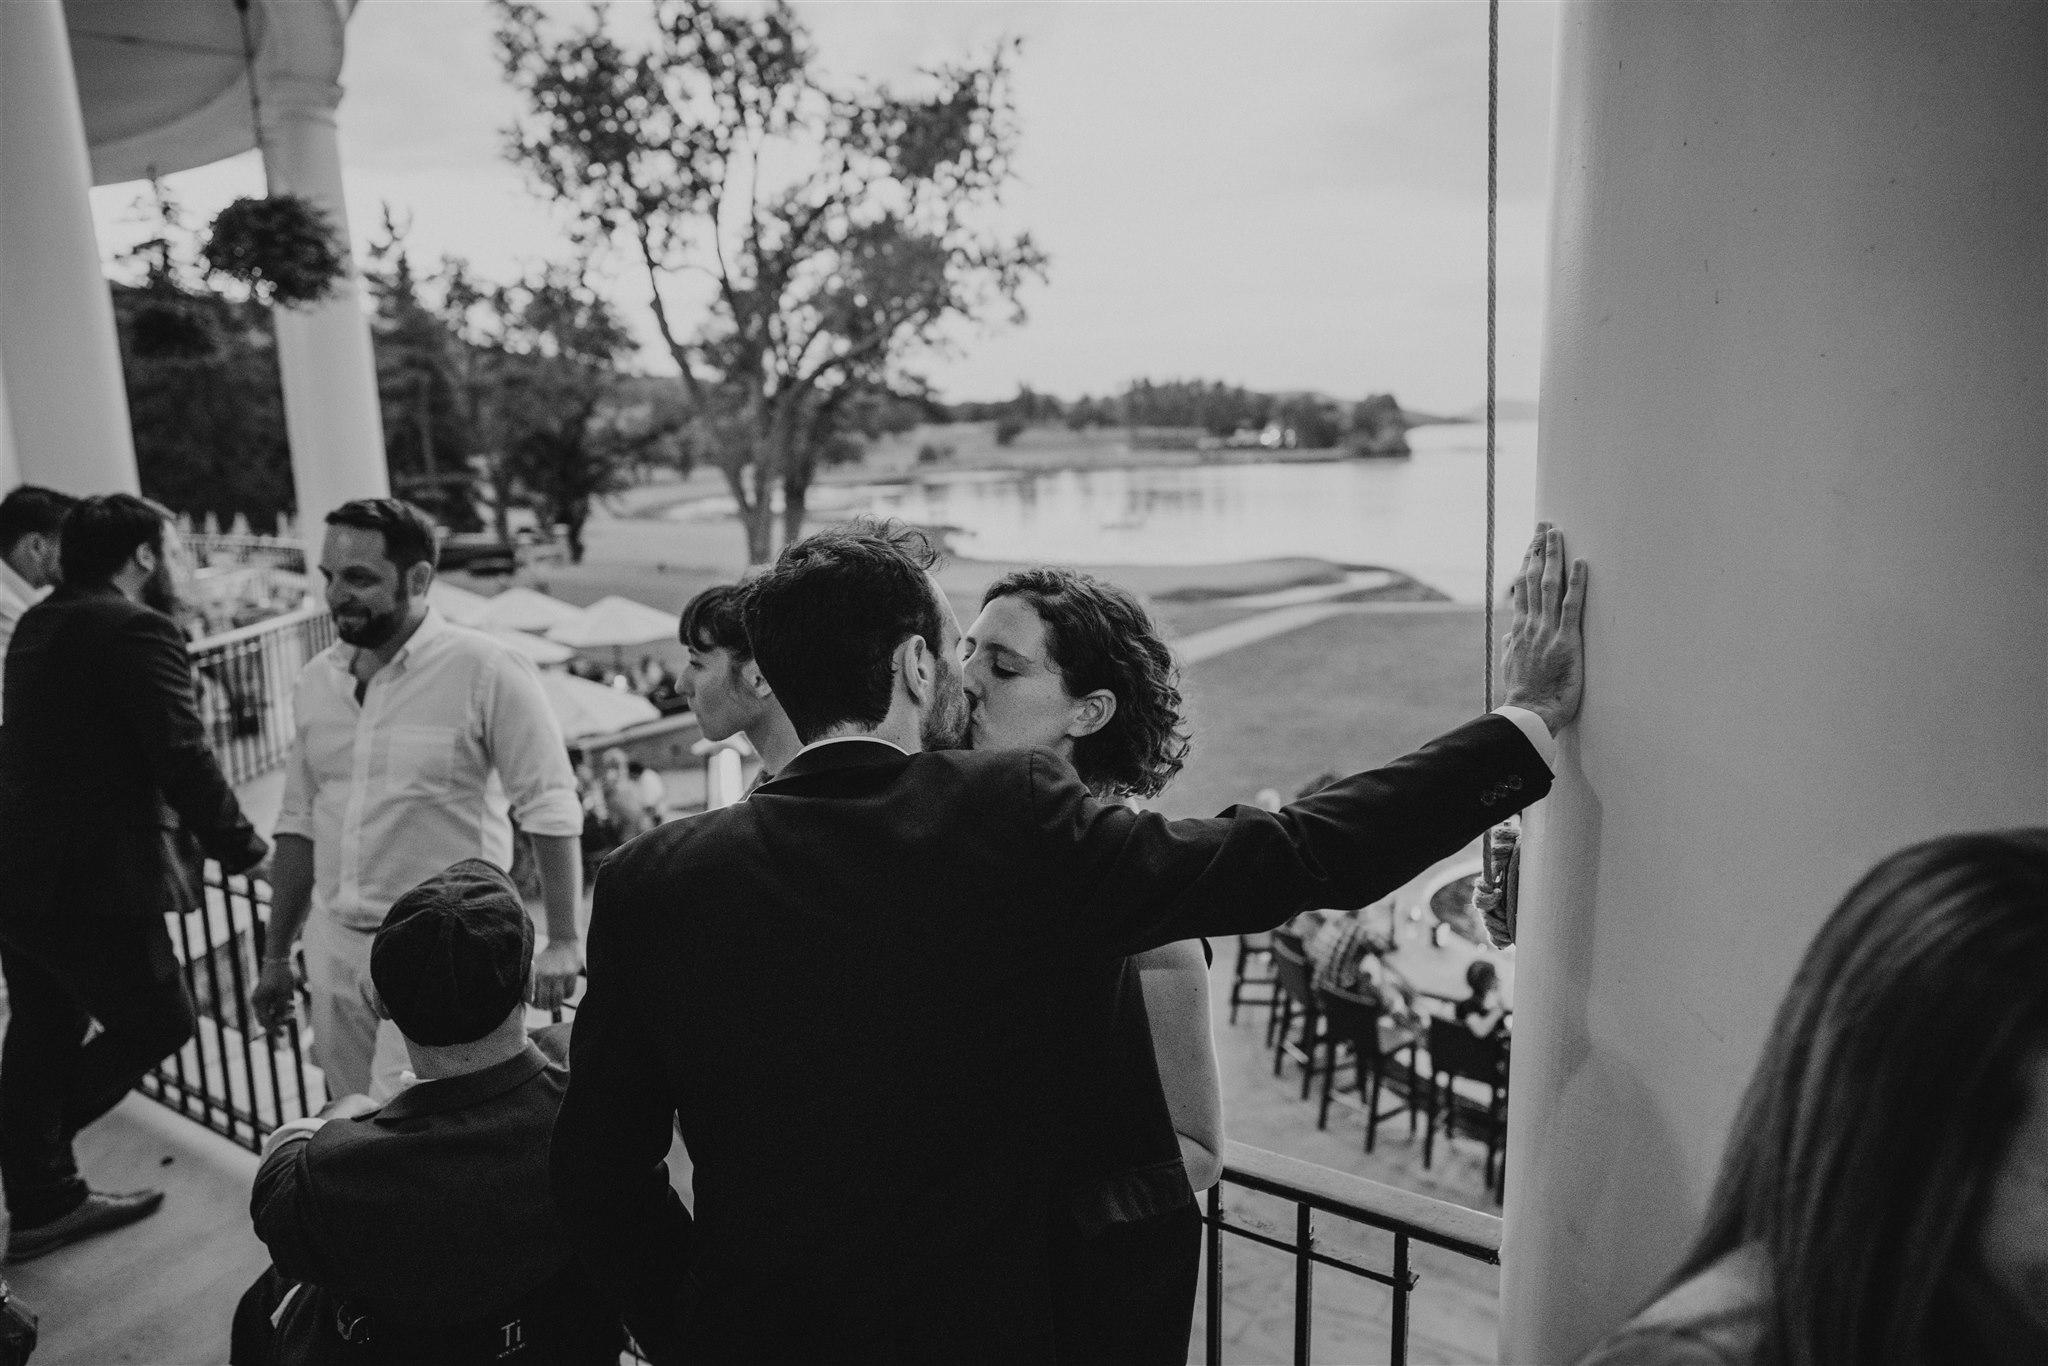 Chellise_Michael_Photography_Hudson_Valley_Wedding_Photographer_Otesaga_Hotel-6197.jpg